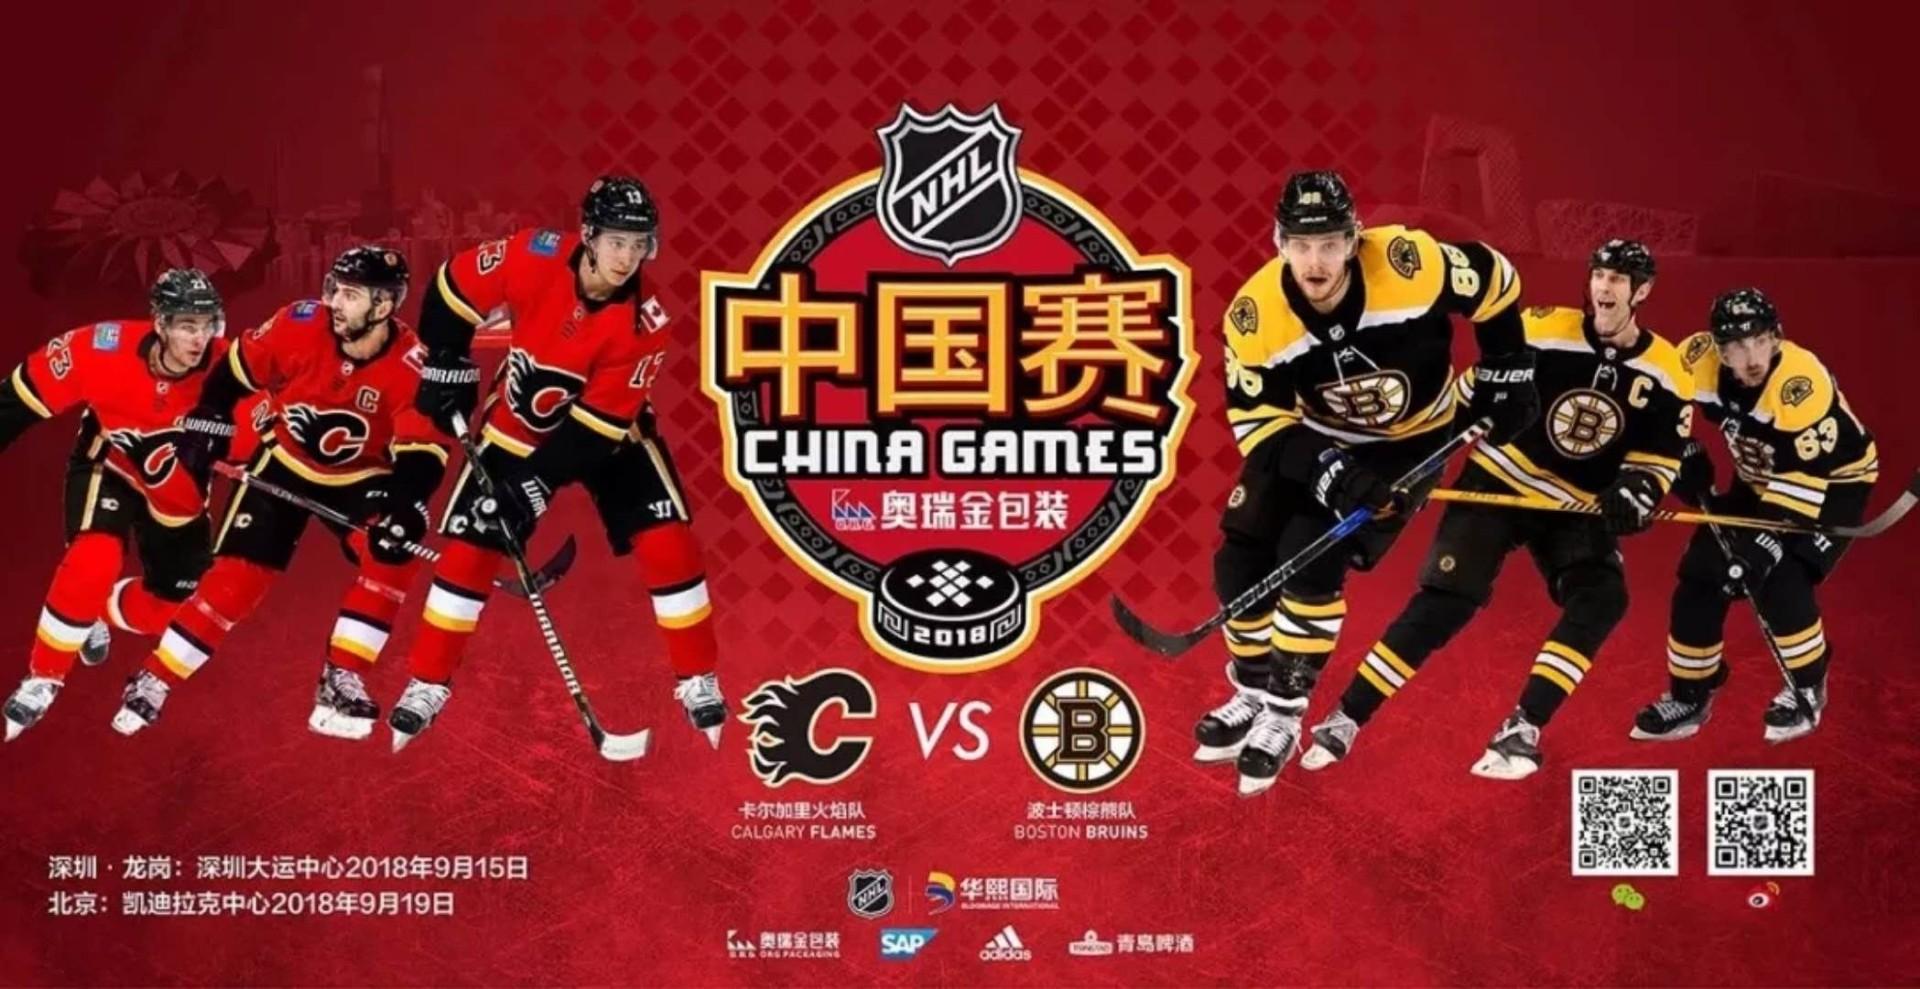 Nhl China Games 2018 Boston Bruins Battle Calgary Flames In